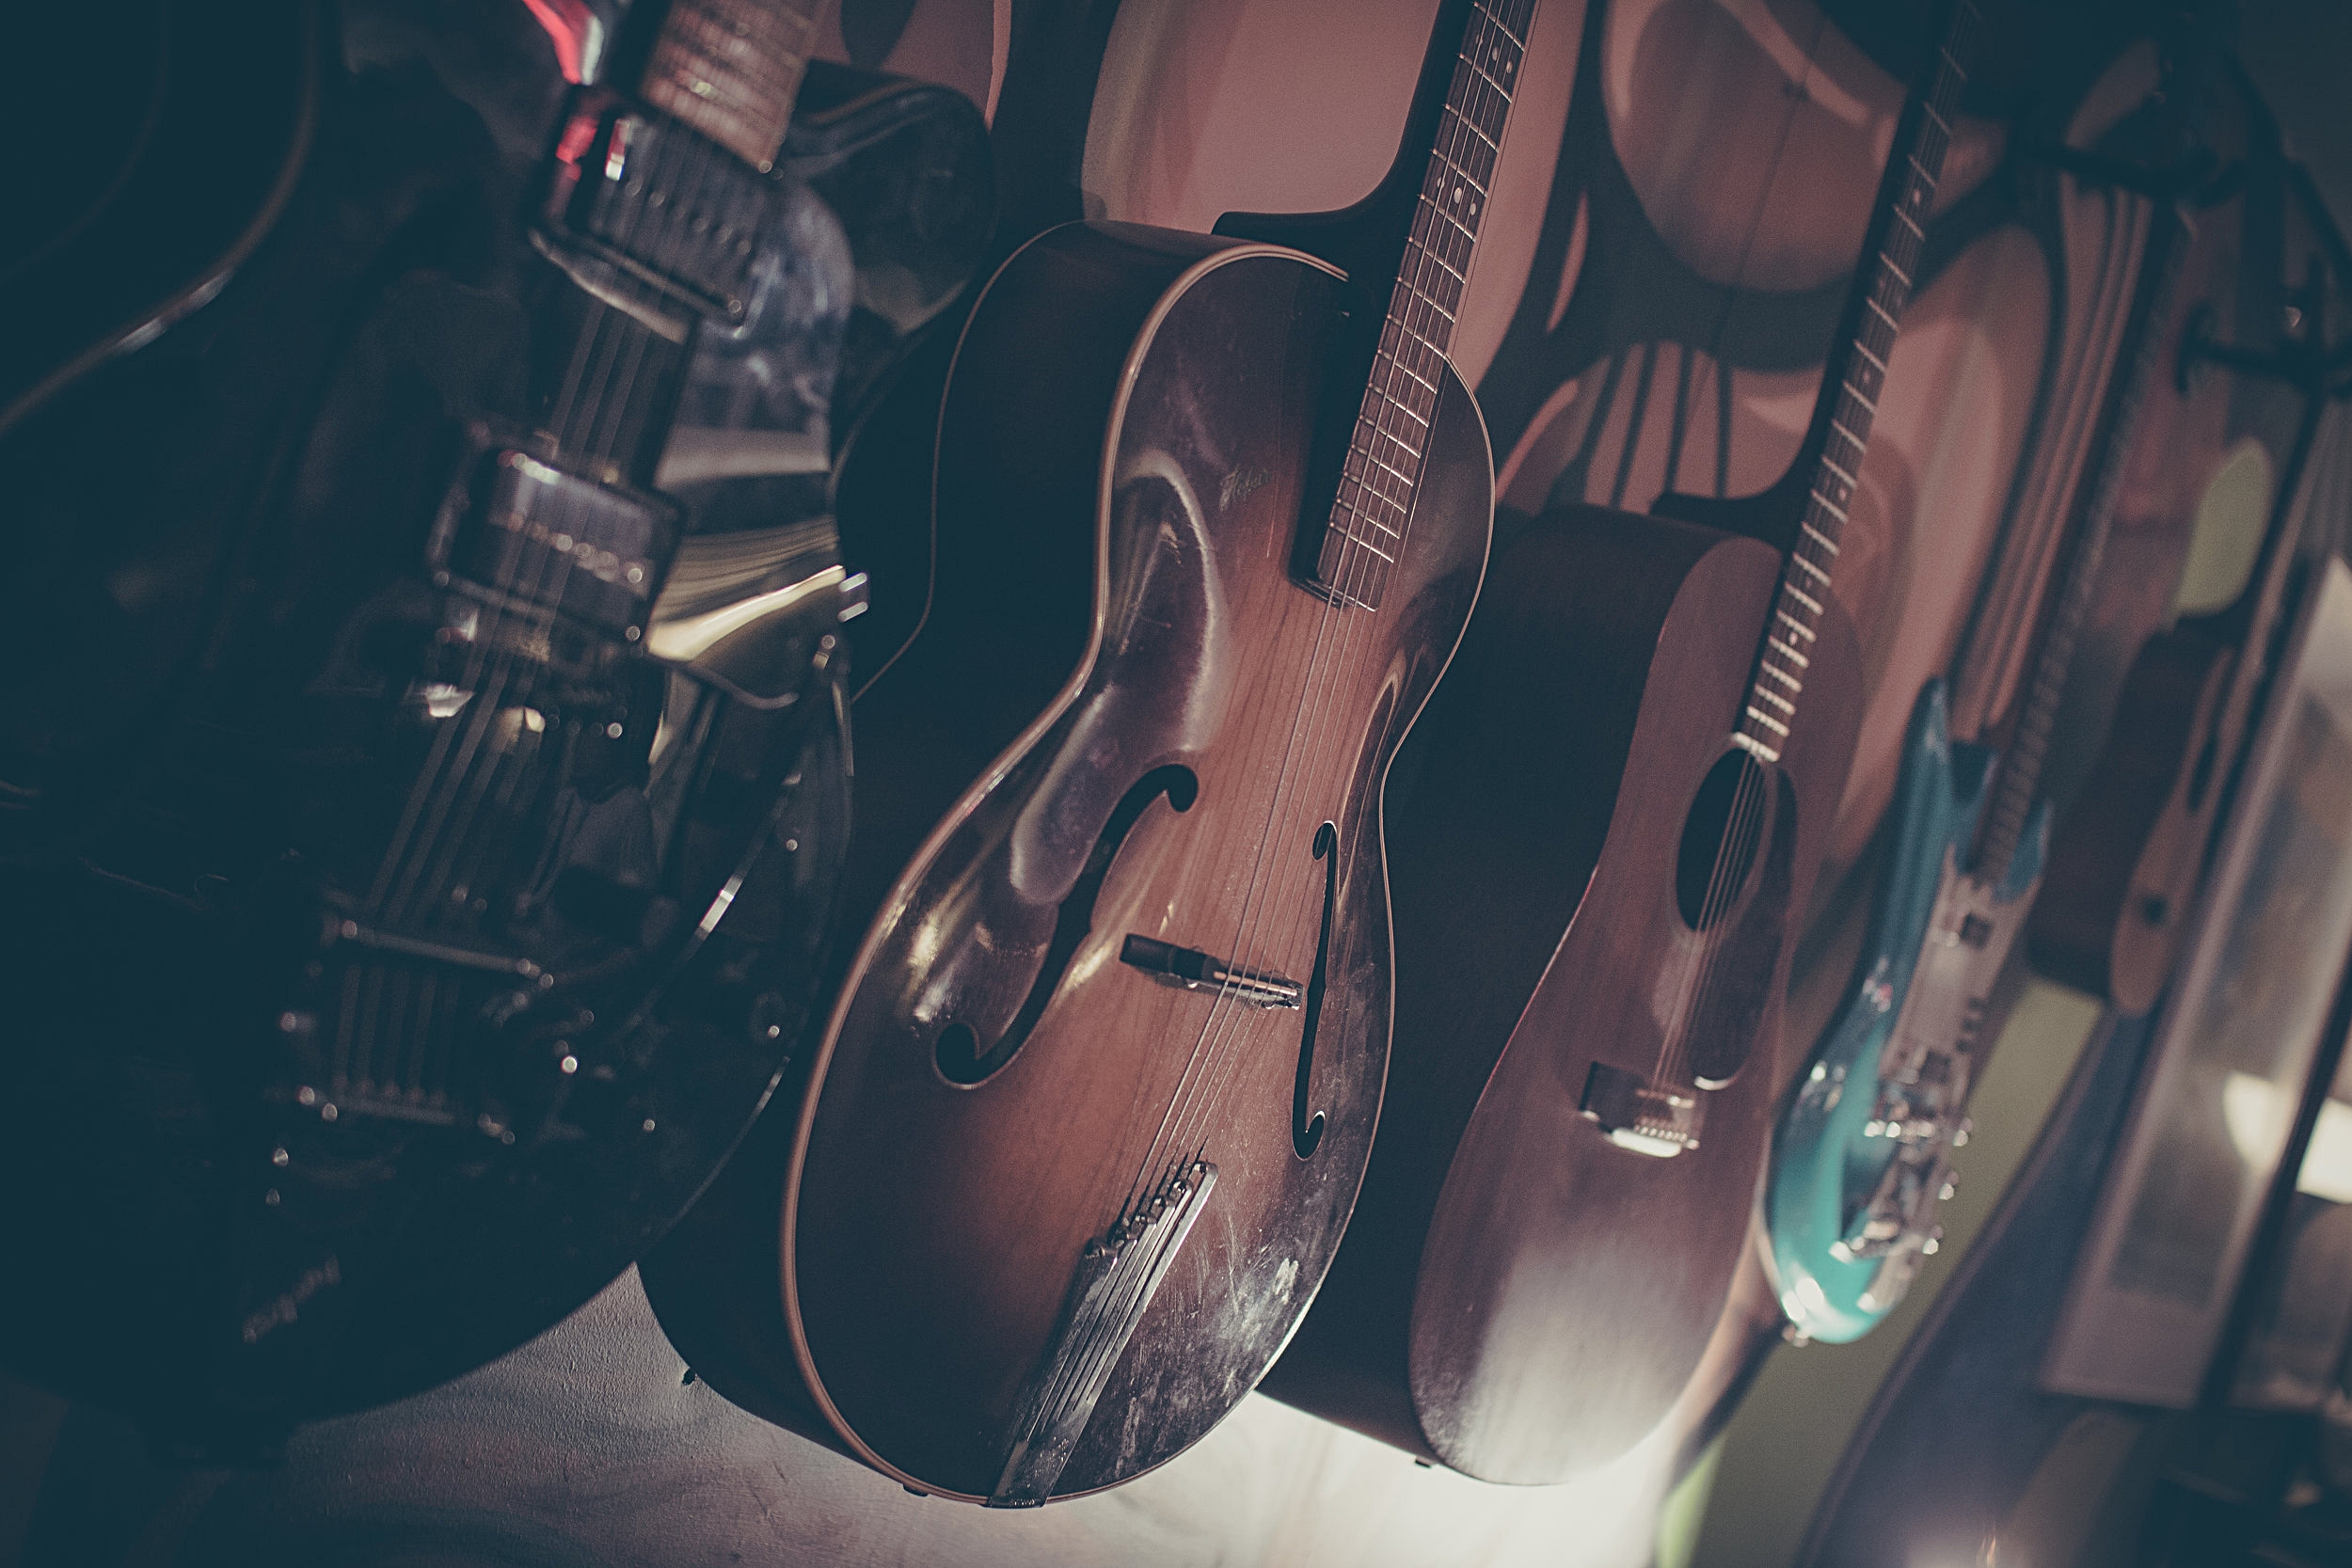 Guitars at Pinhole Sound Studio